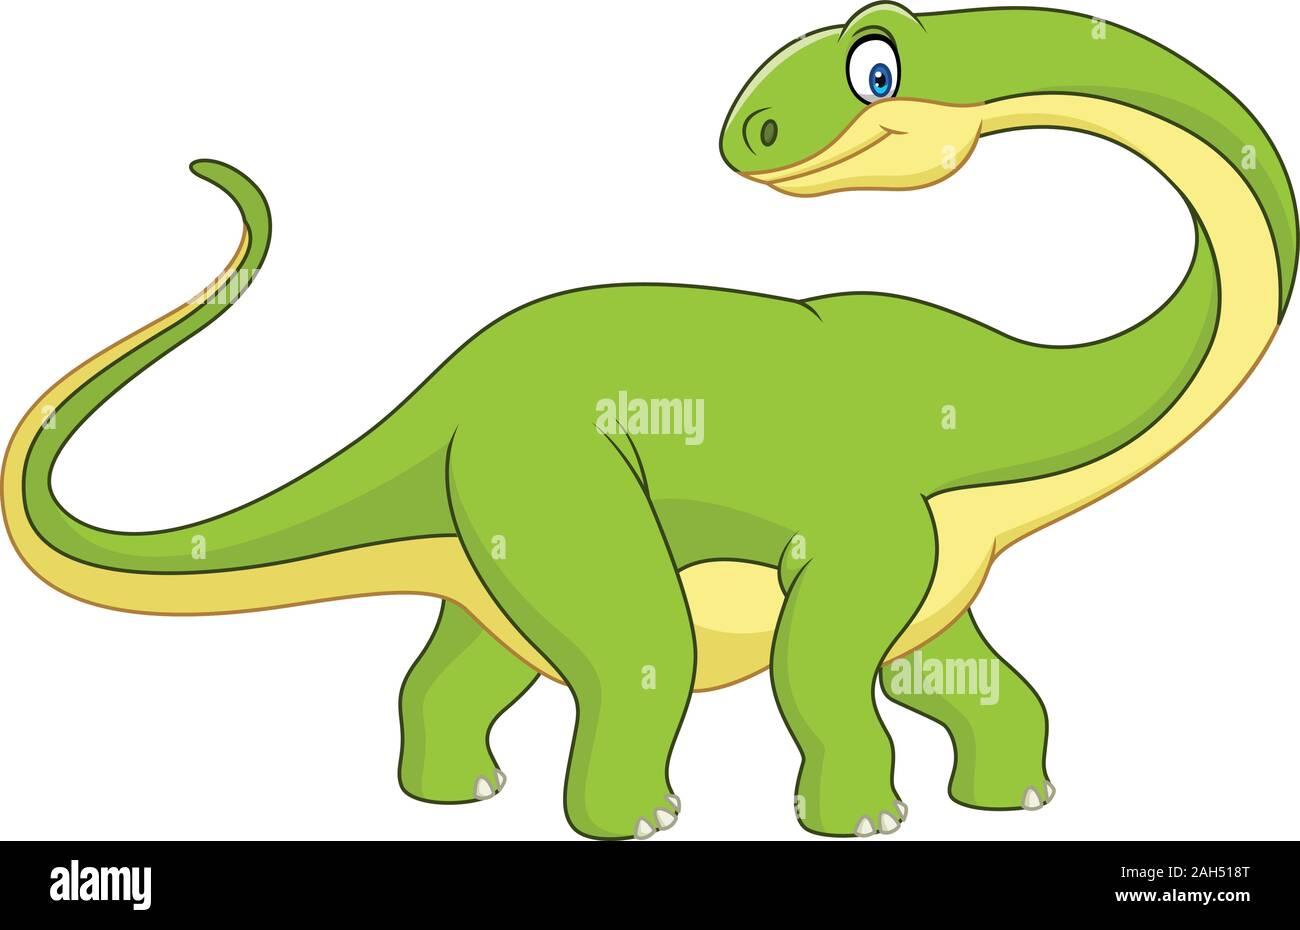 Cute Dibujos Animados Dinosaurios Imagen Vector De Stock Alamy Dibujos infantiles de dinosaurios para decorar tu pagina. https www alamy es cute dibujos animados dinosaurios image337556936 html